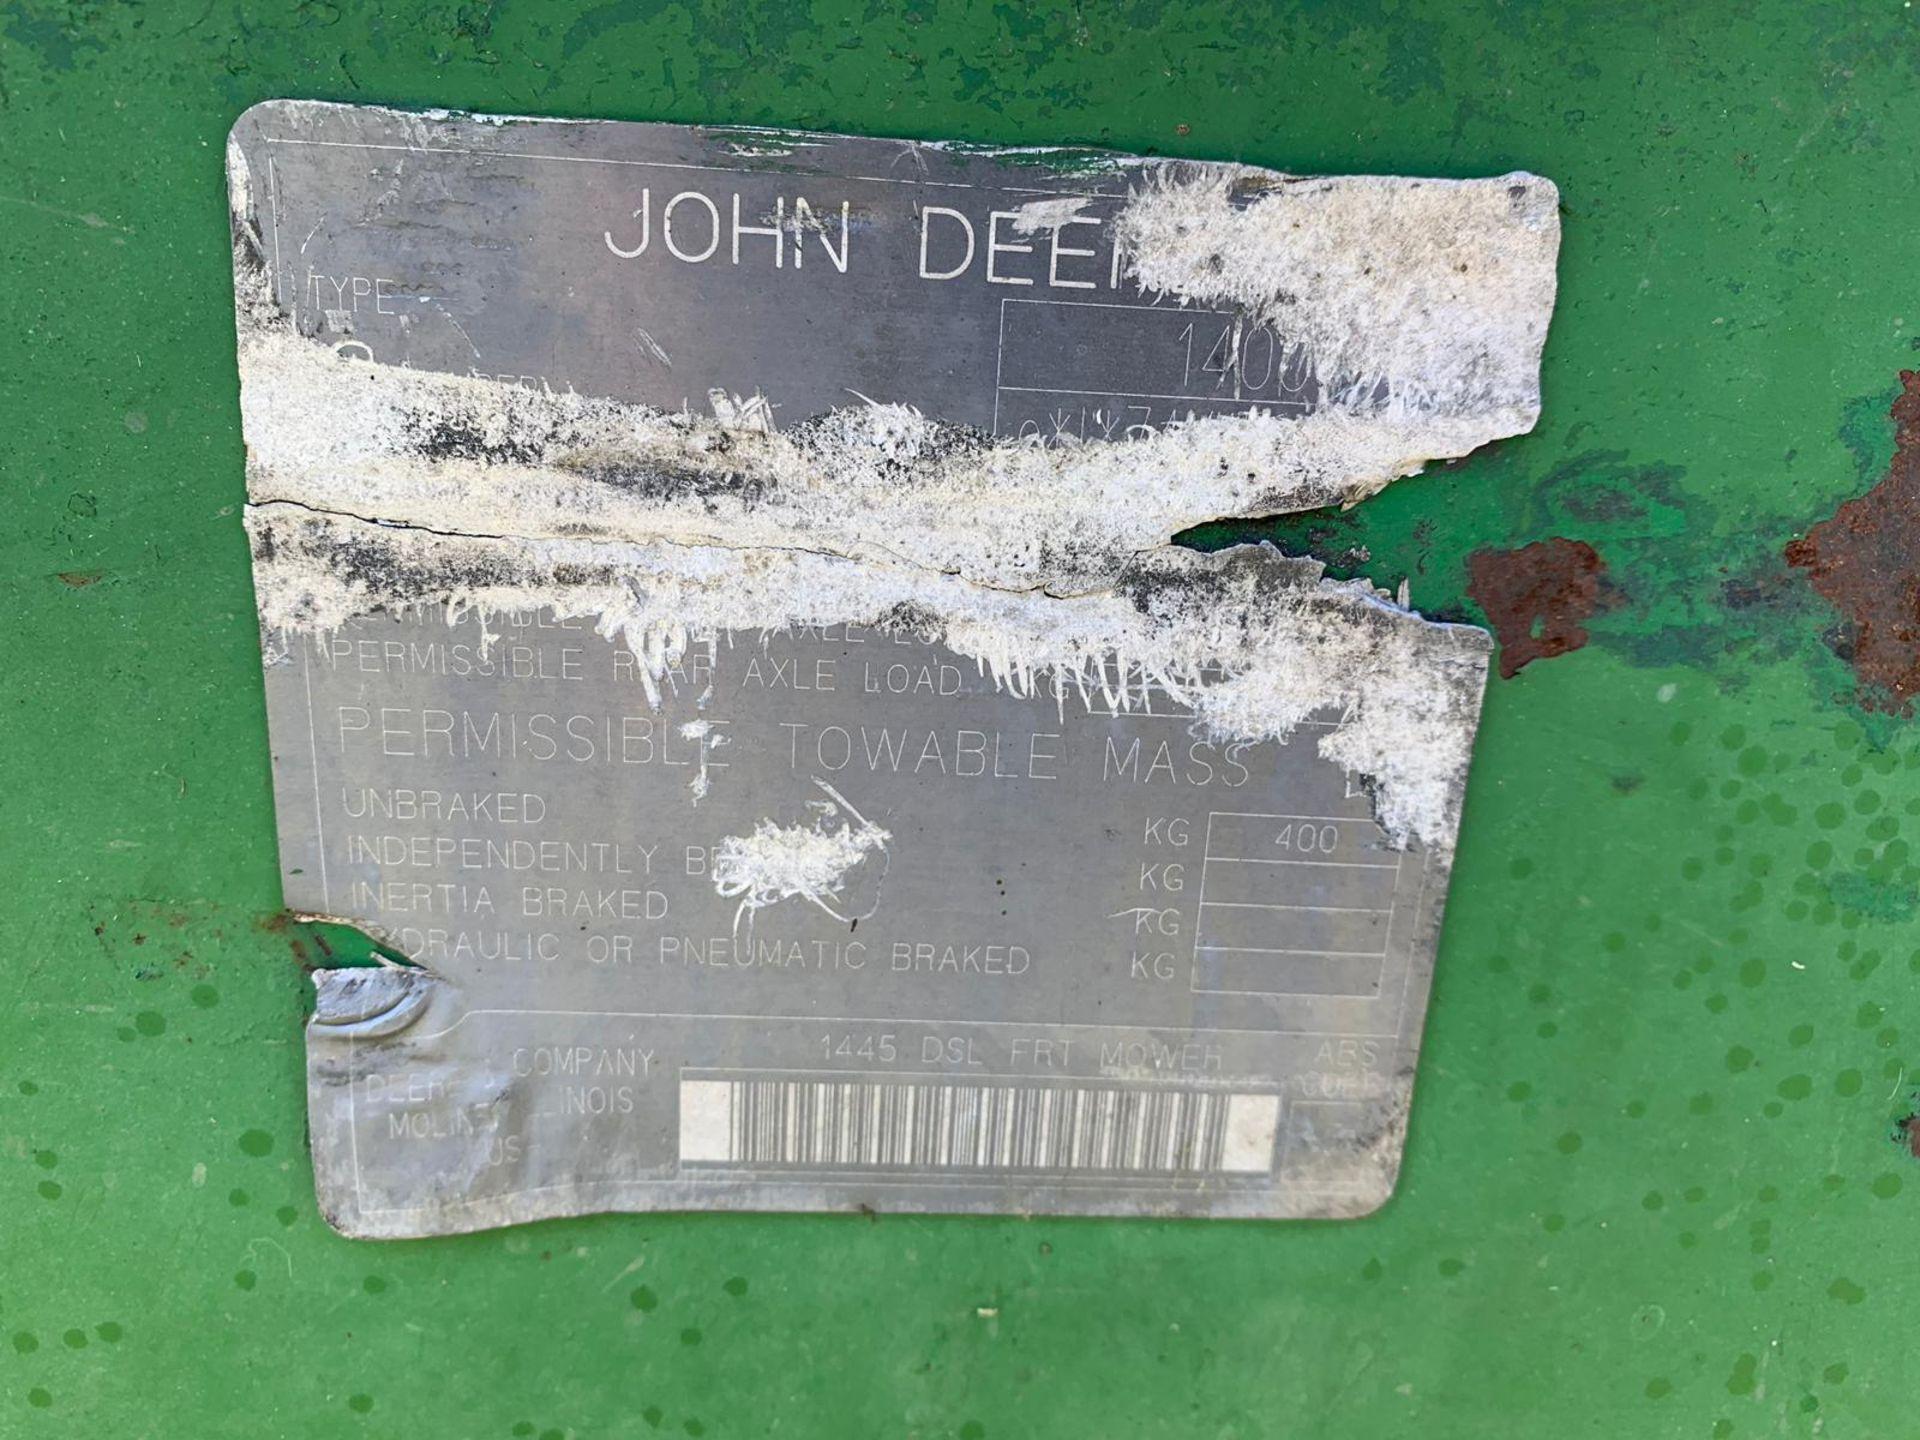 Lot 26 - JOHN DEERE 1445 SERIES II 4WD RIDE ON DIESEL LAWN MOWER C/W OUT-FRONT ROTARY CUTTING DECK *PLUS VAT*